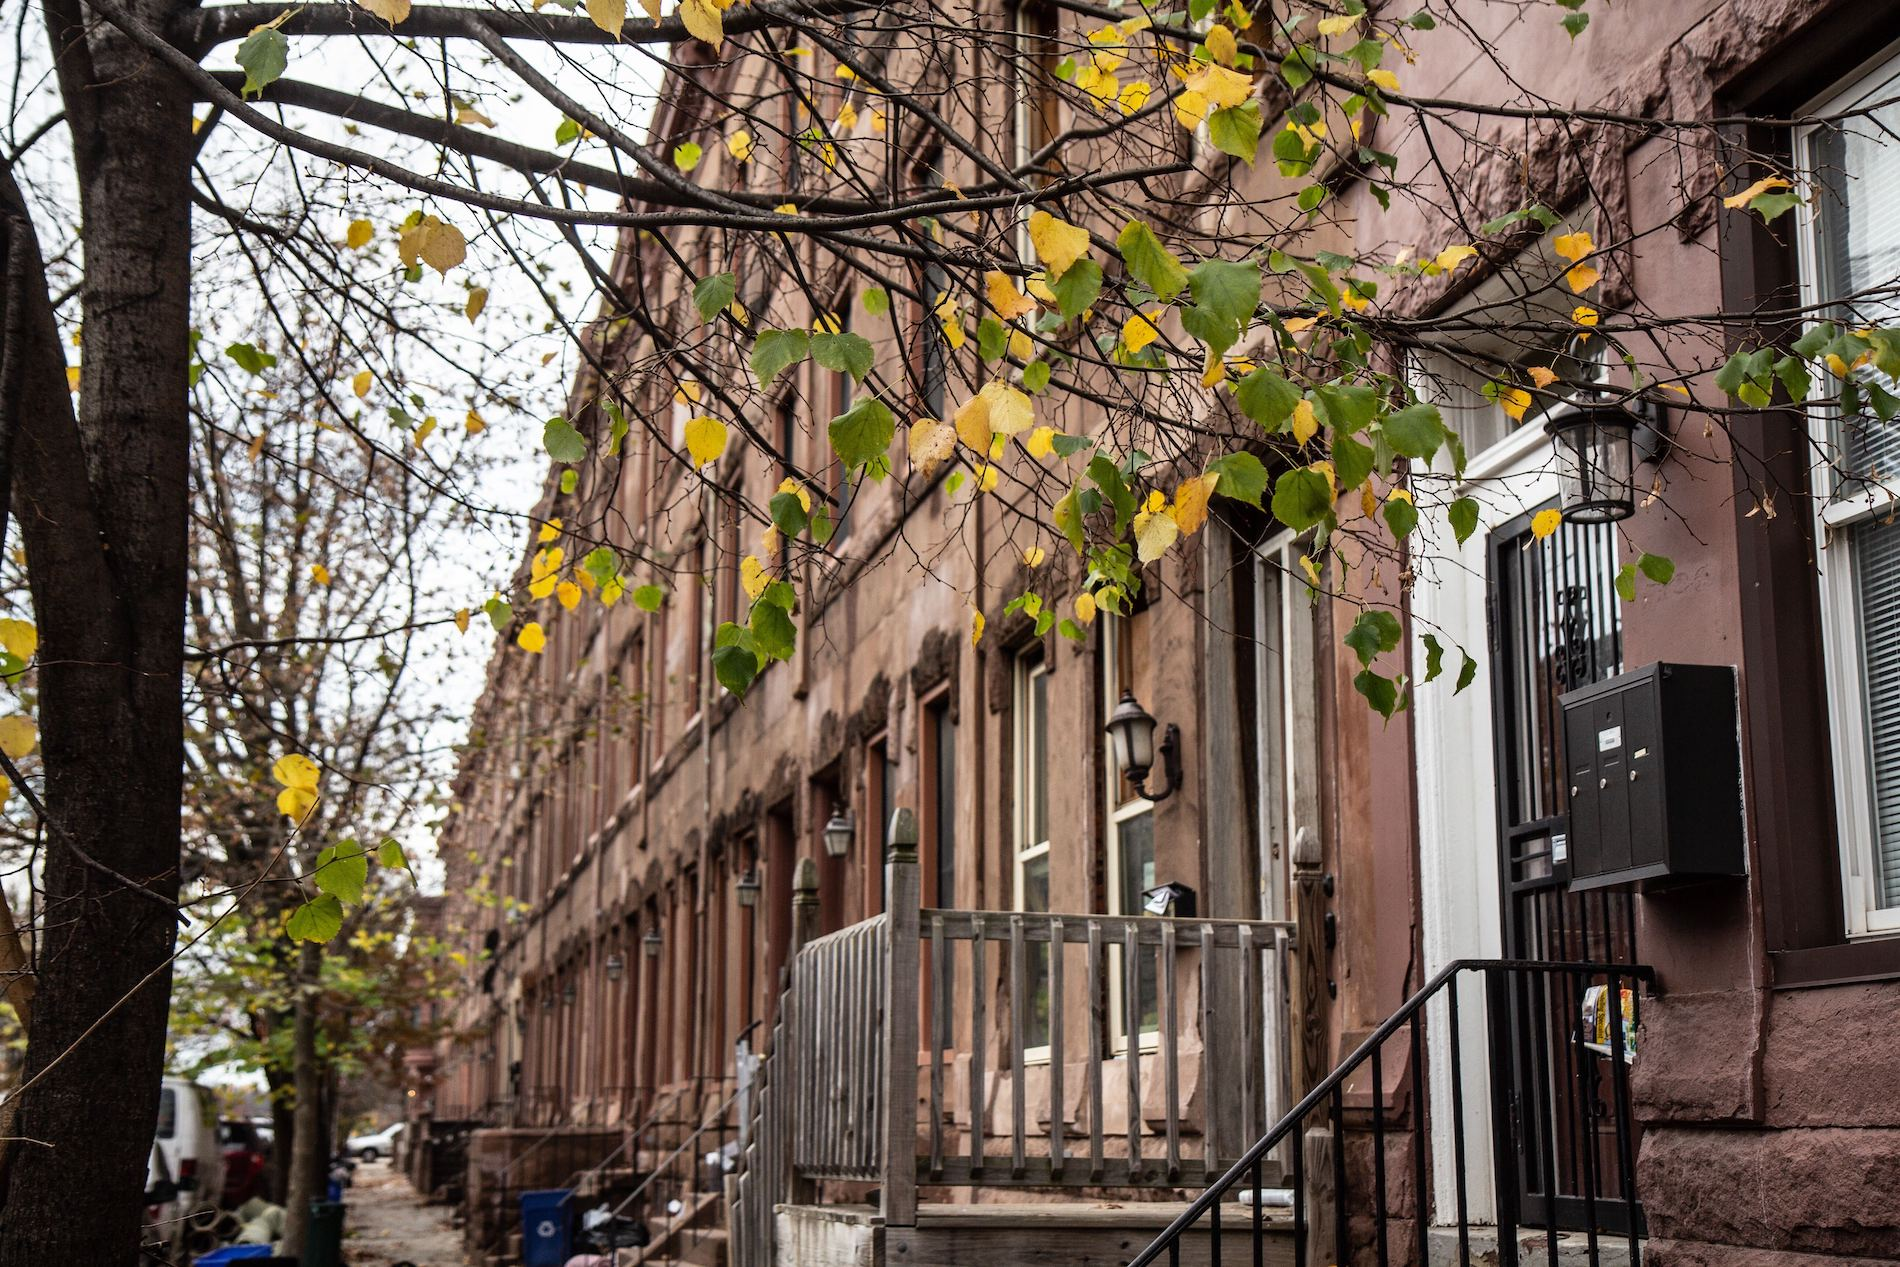 Brownstones on the 3100 block of Diamond Street in Philadelphia's Strawberry Mansion neighborhood.